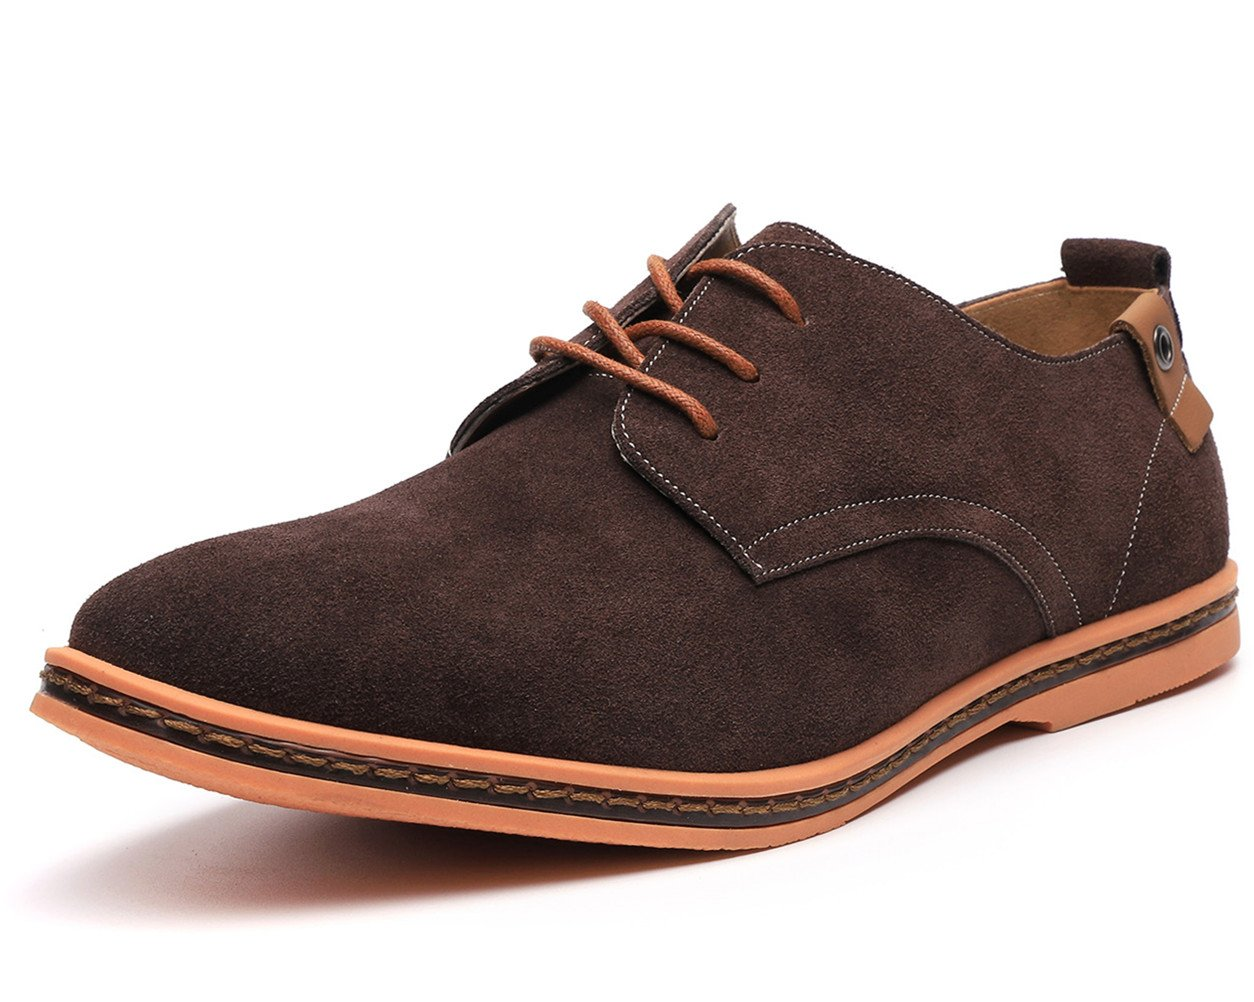 Dadawen Men's Brown Leather Oxford Shoe - 11 D(M) US by DADAWEN (Image #2)